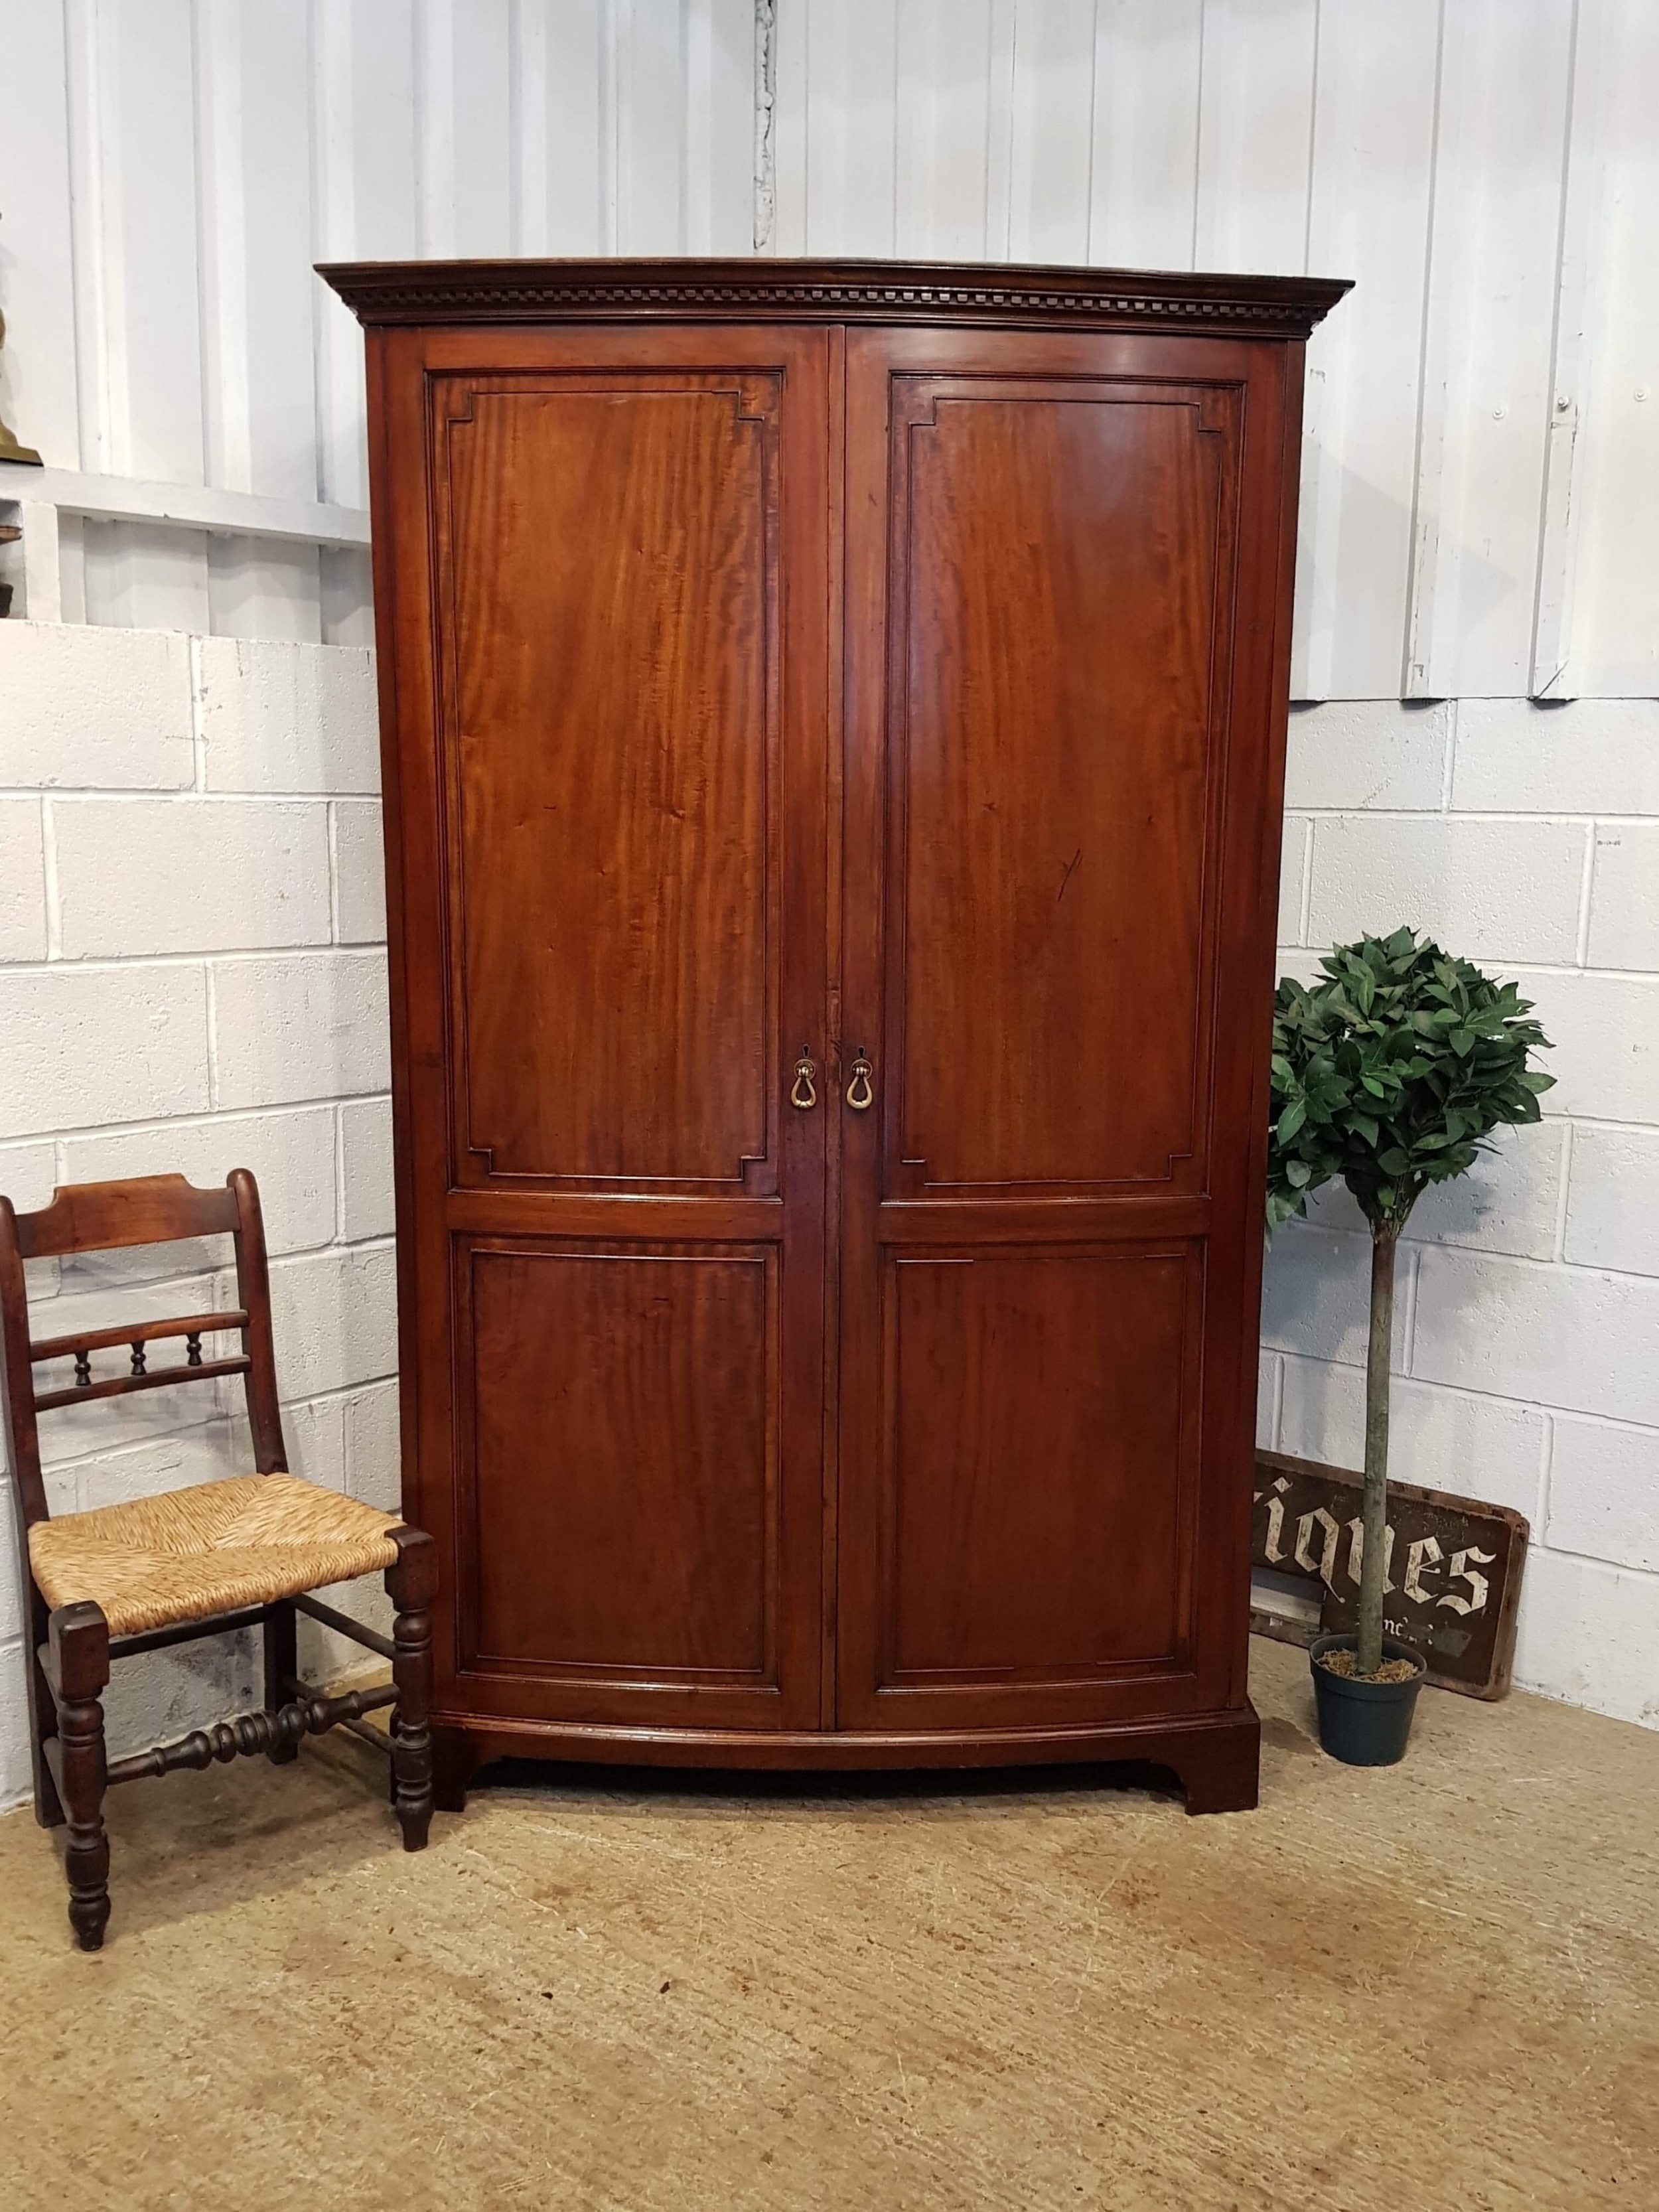 The Cheapest Price Edwardian Bowfront 2 Door Oak Wardrobe With Key Antique Furniture Edwardian (1901-1910)